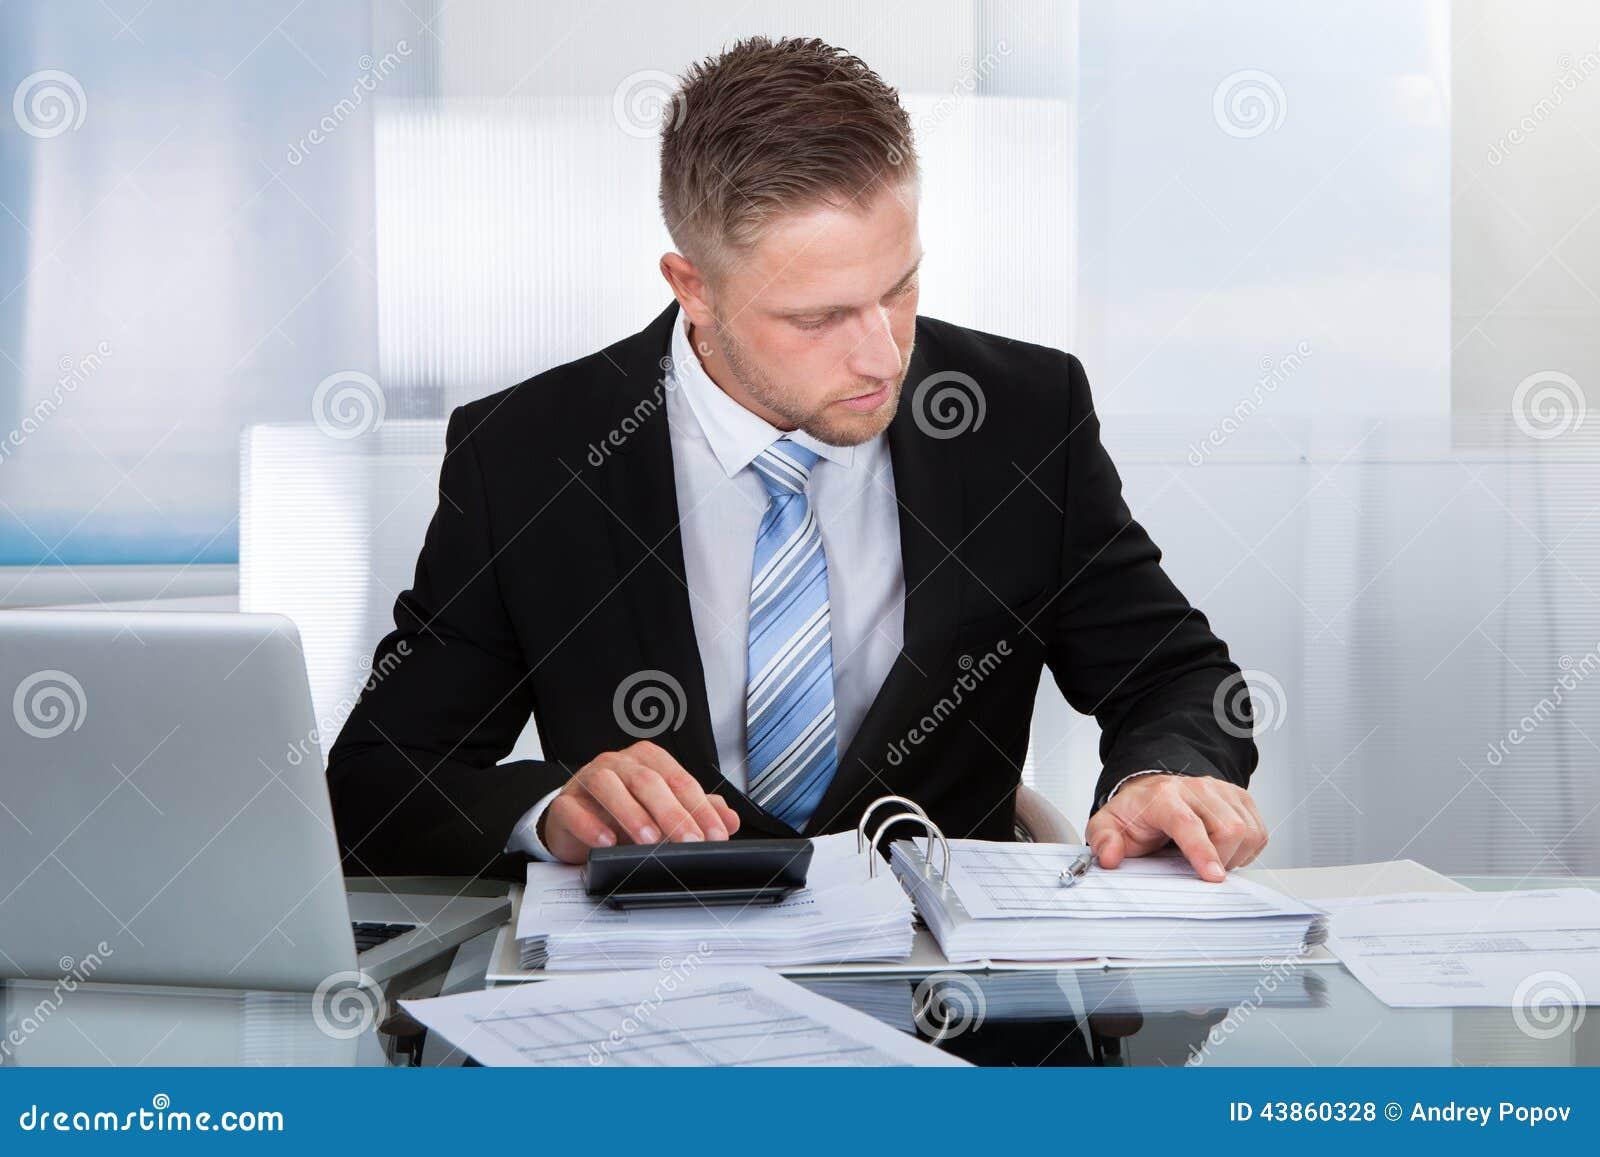 Hardworking businessman analyzing a report